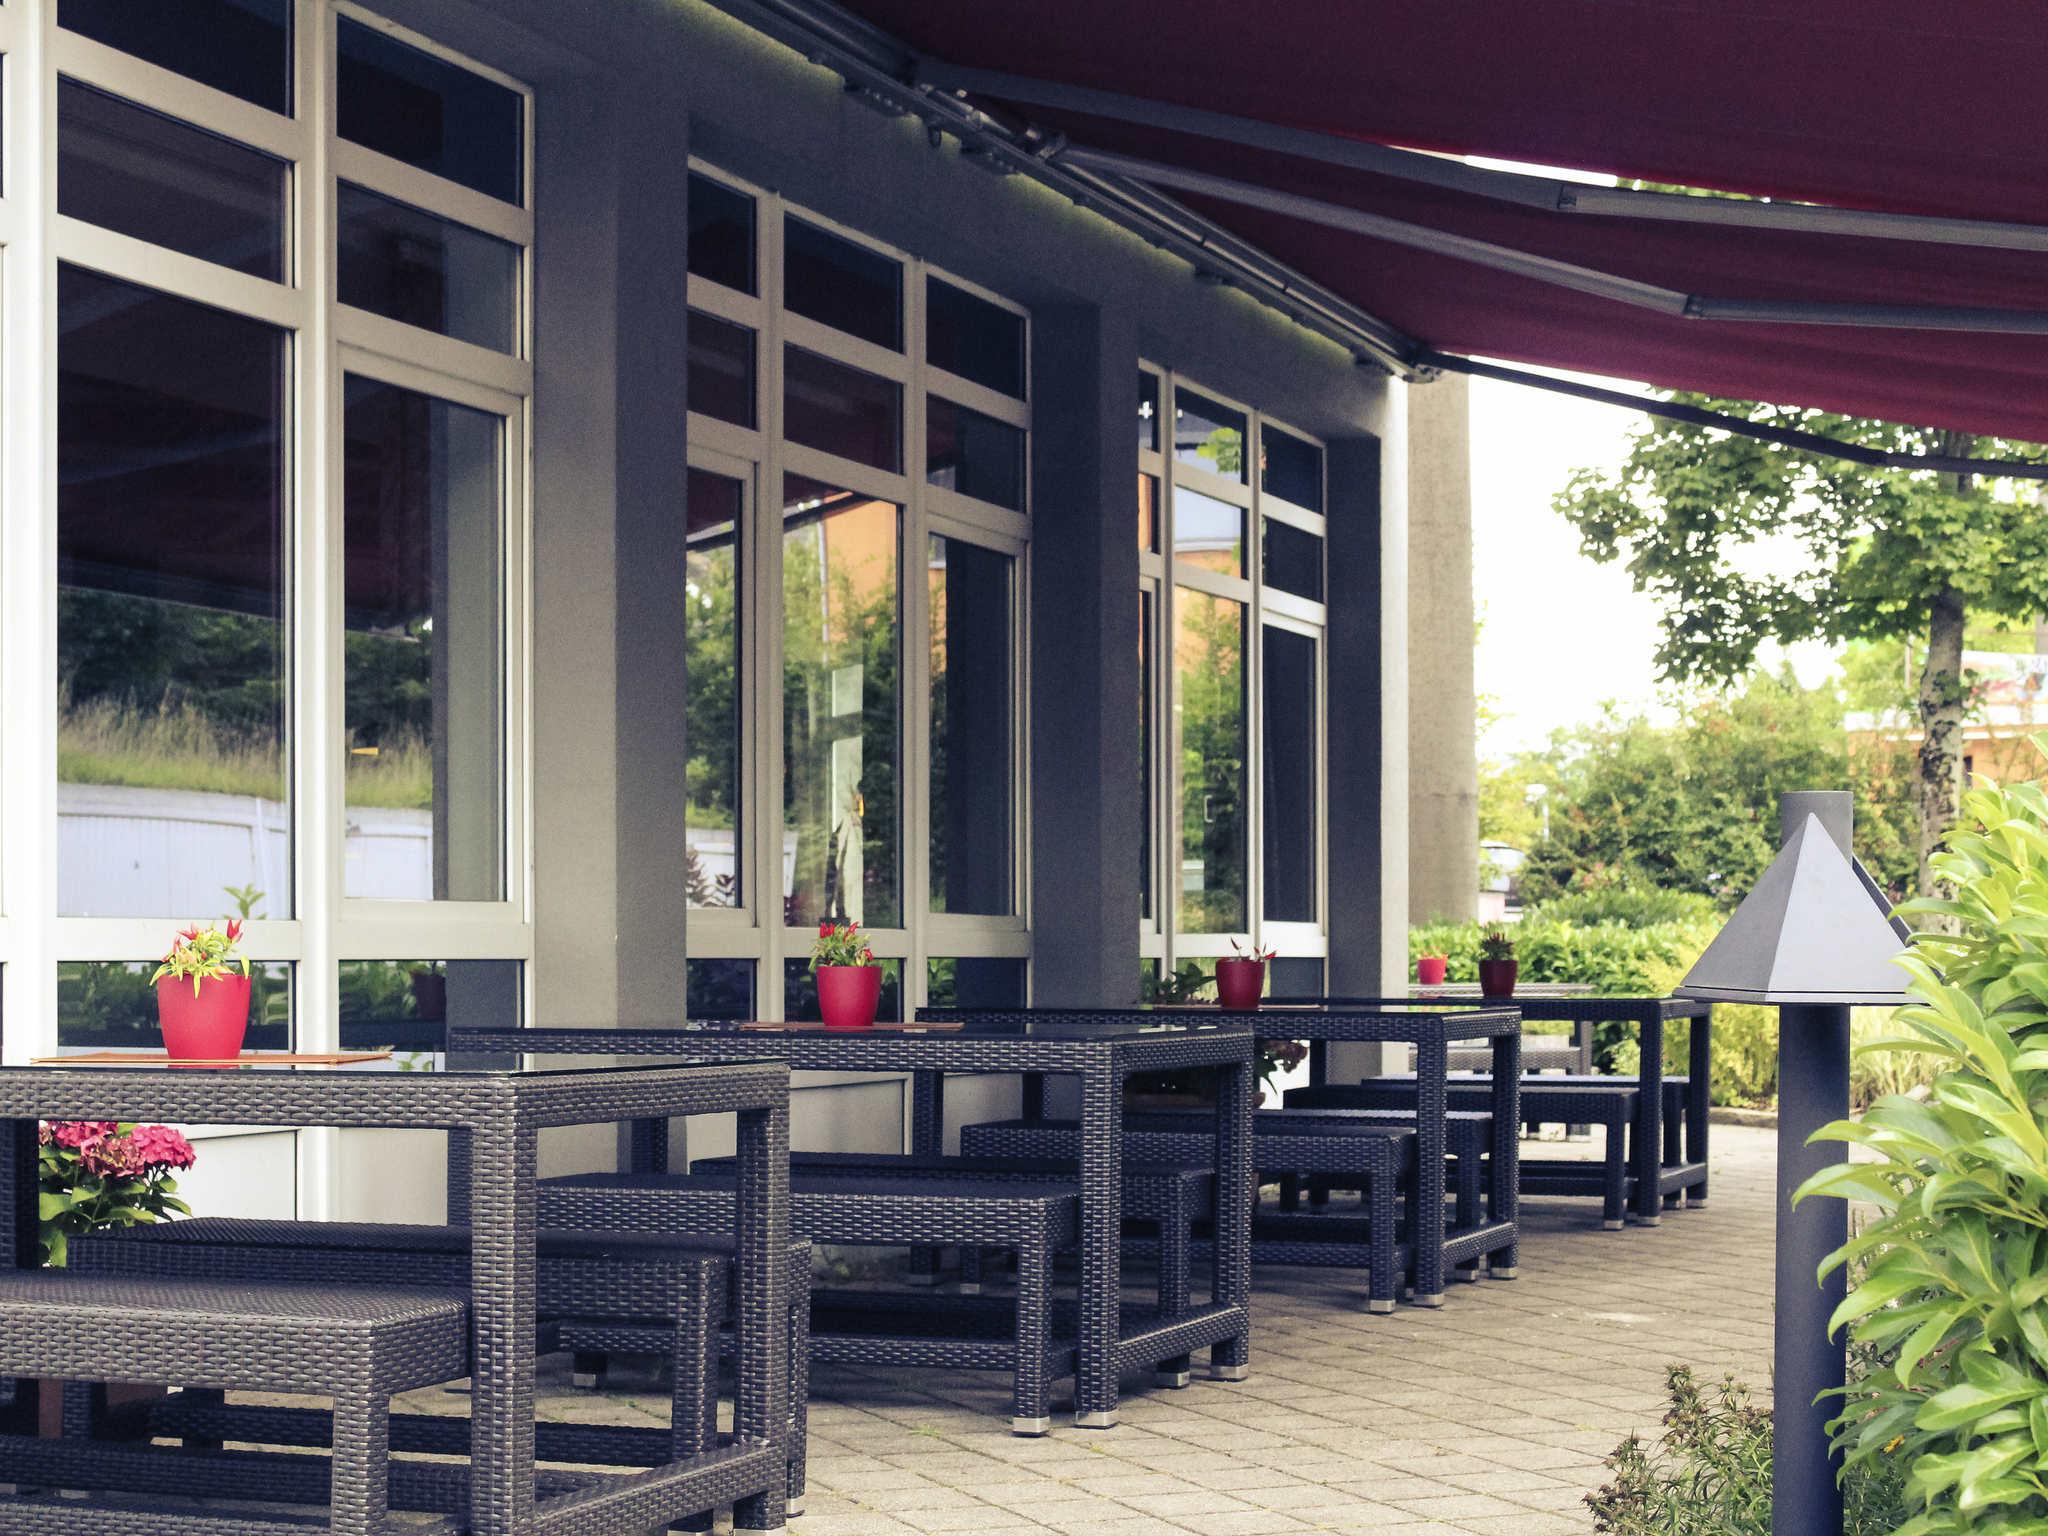 Mercure Hotel Remscheid Restaurant